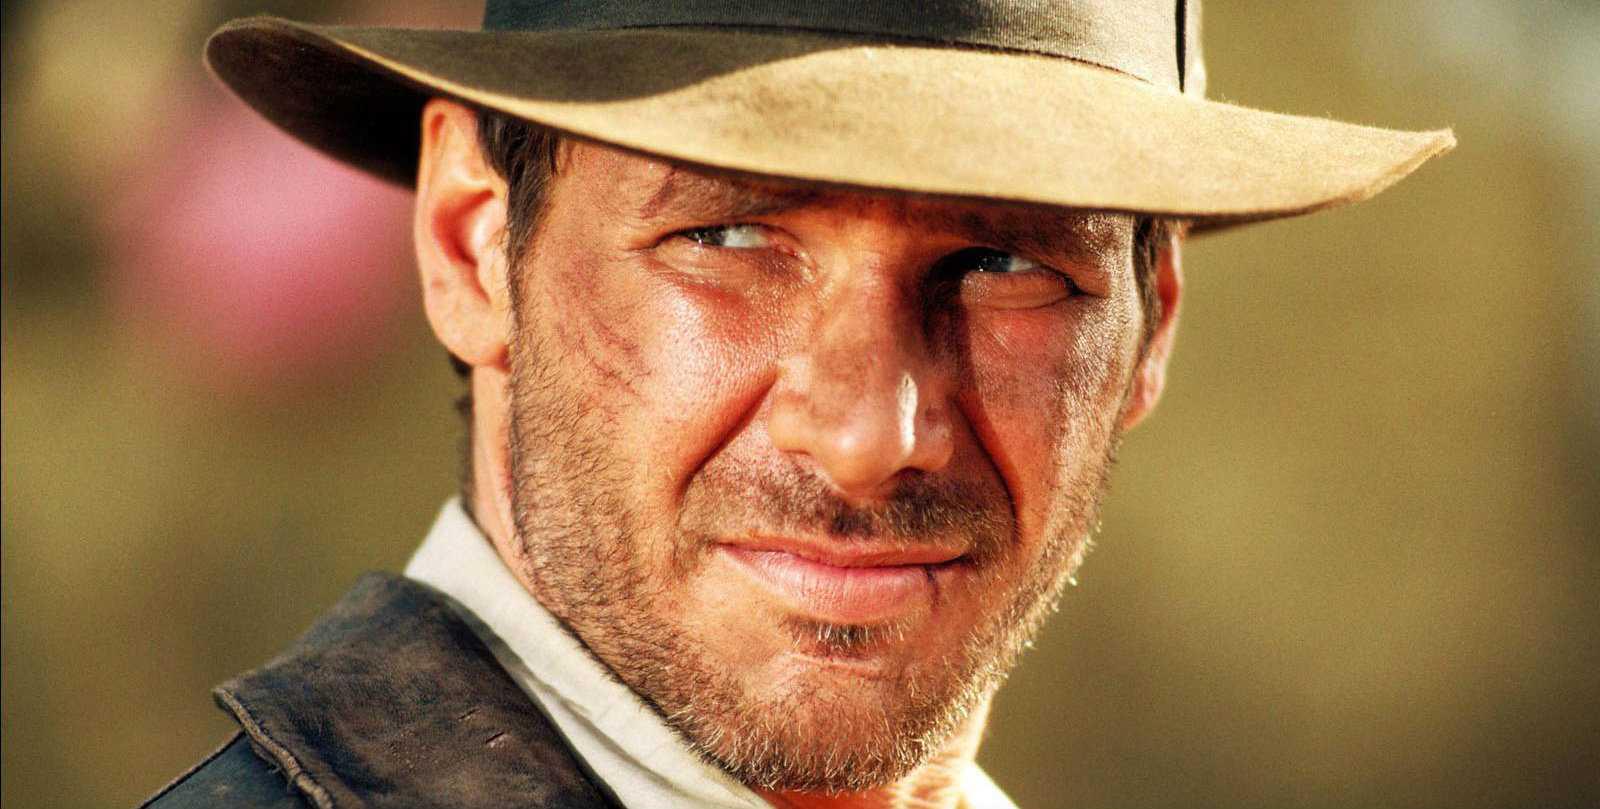 Indiana Jones 5: ¿Harrison Ford rejuvenecido para la película?  (Foto)